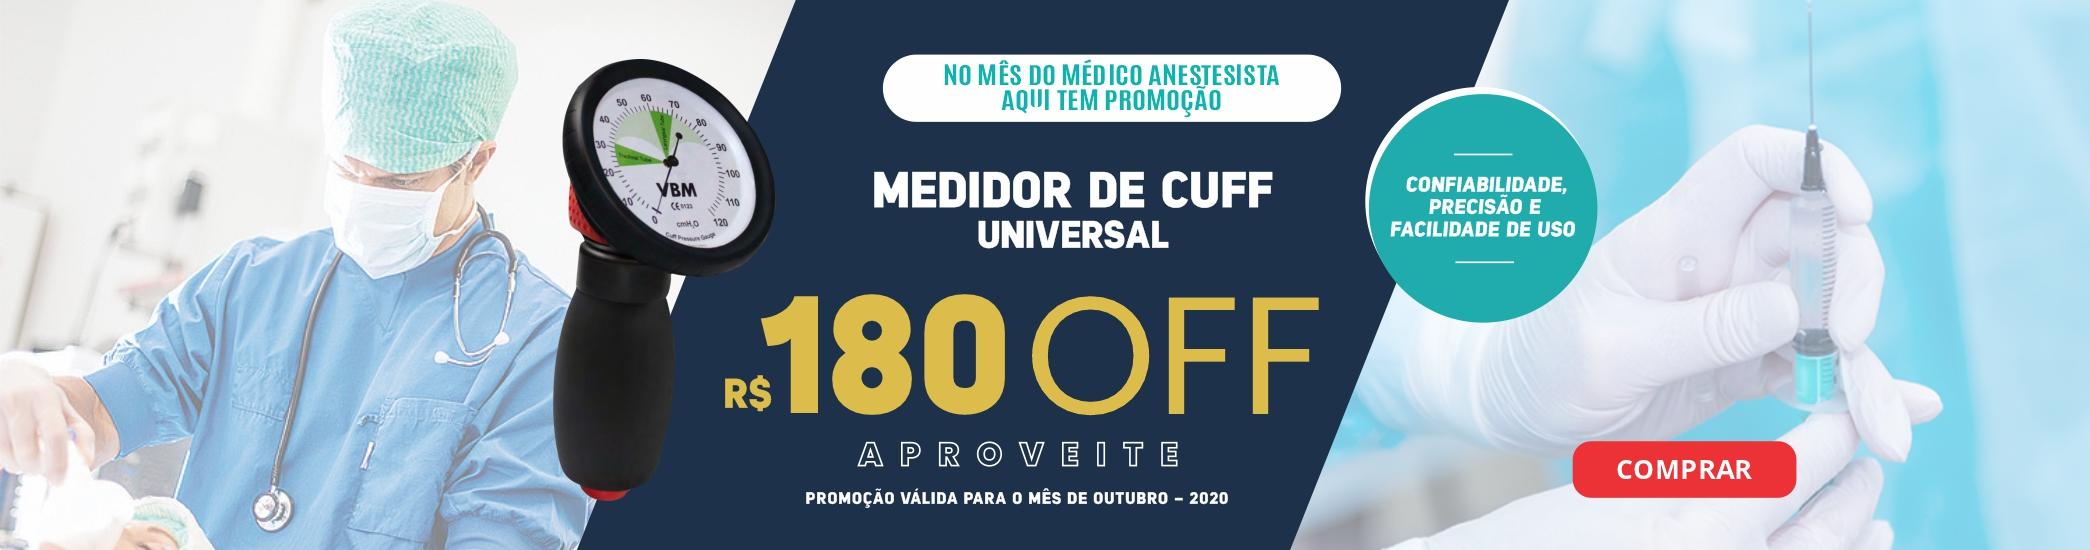 Promoção Medidor de Cuff